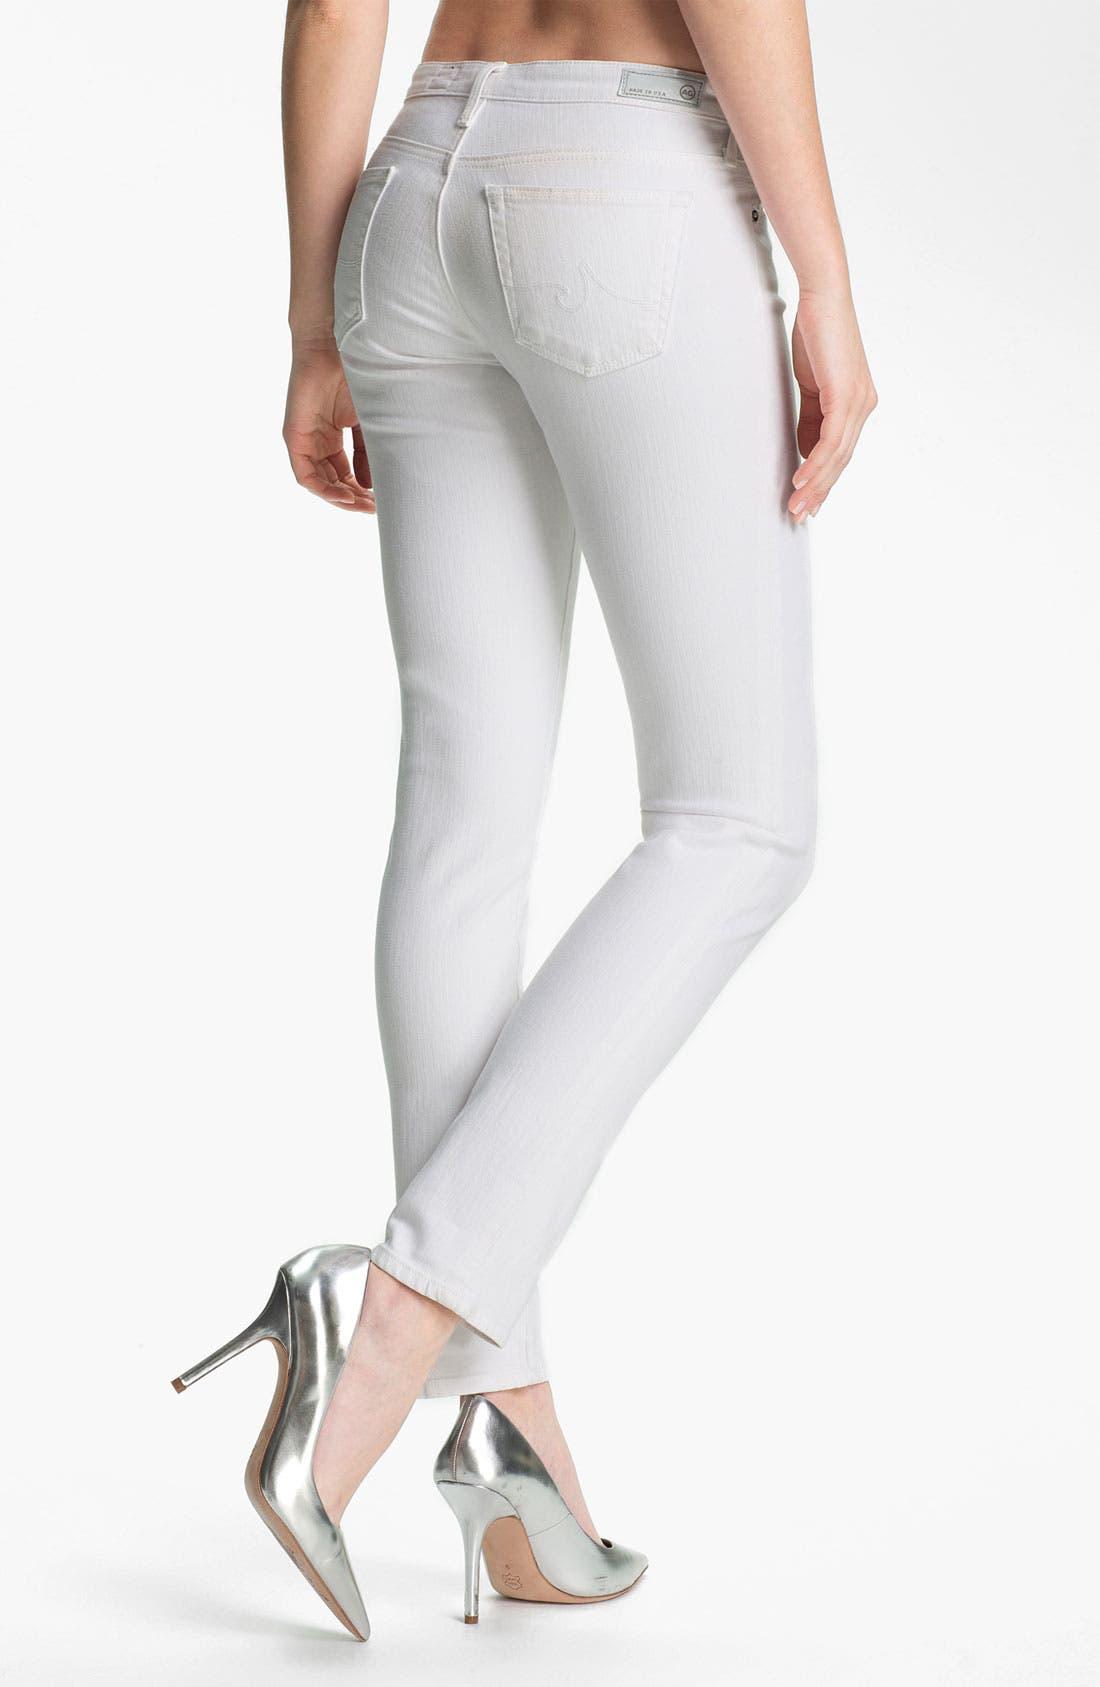 AG, Jeans 'Stilt' Cigarette Leg Stretch Jeans, Alternate thumbnail 3, color, 100